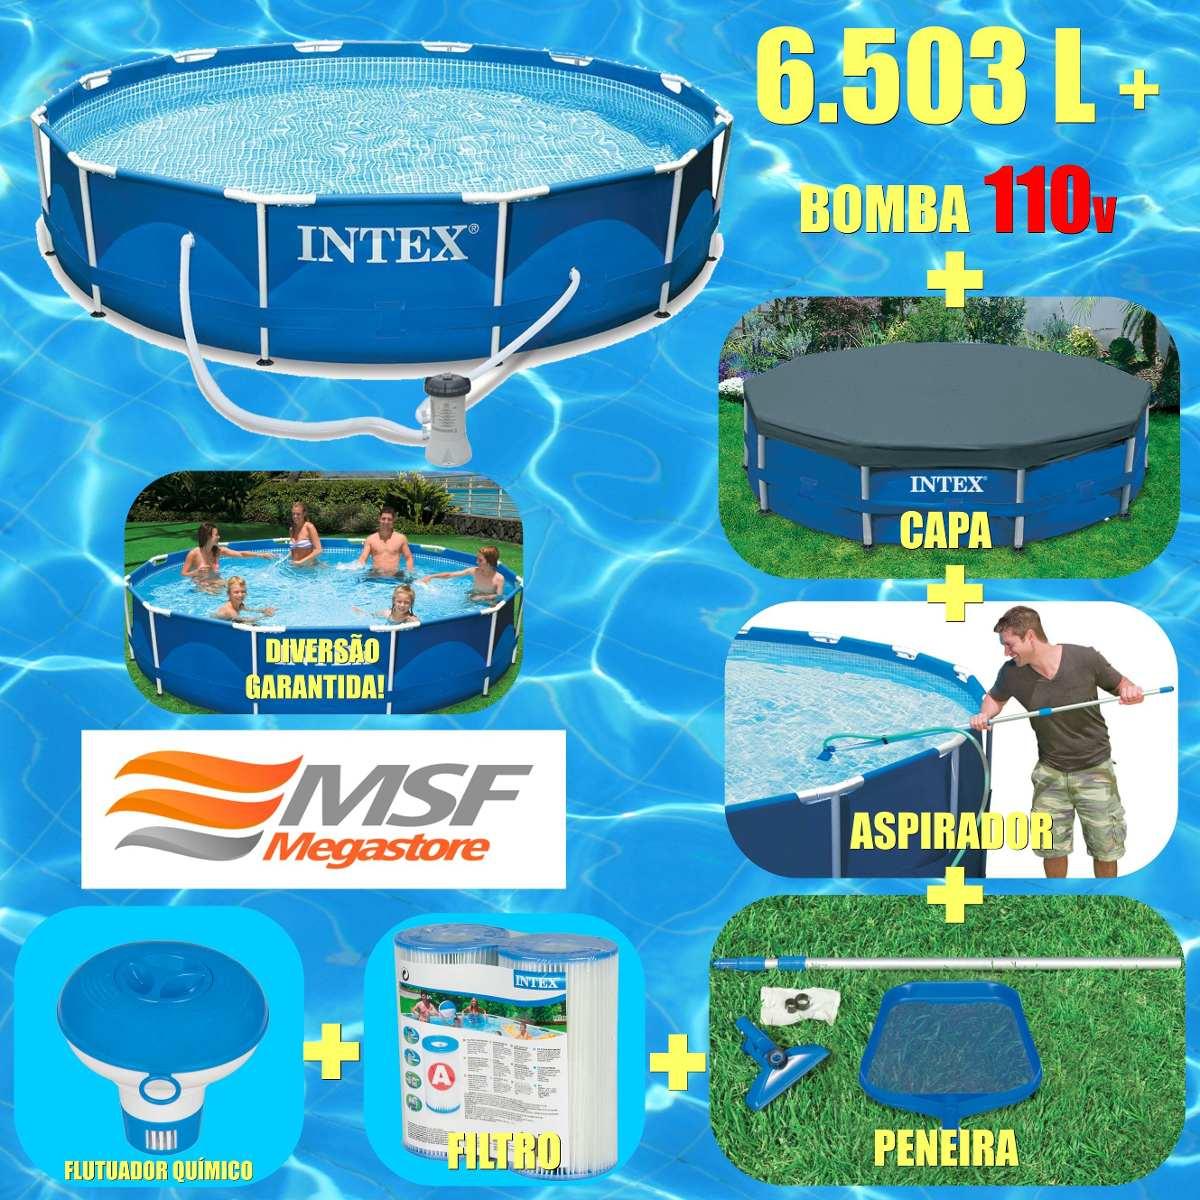 Piscina intex 6503 l bomba filtro capa kit de limpeza 110v for Filtro para piscina intex